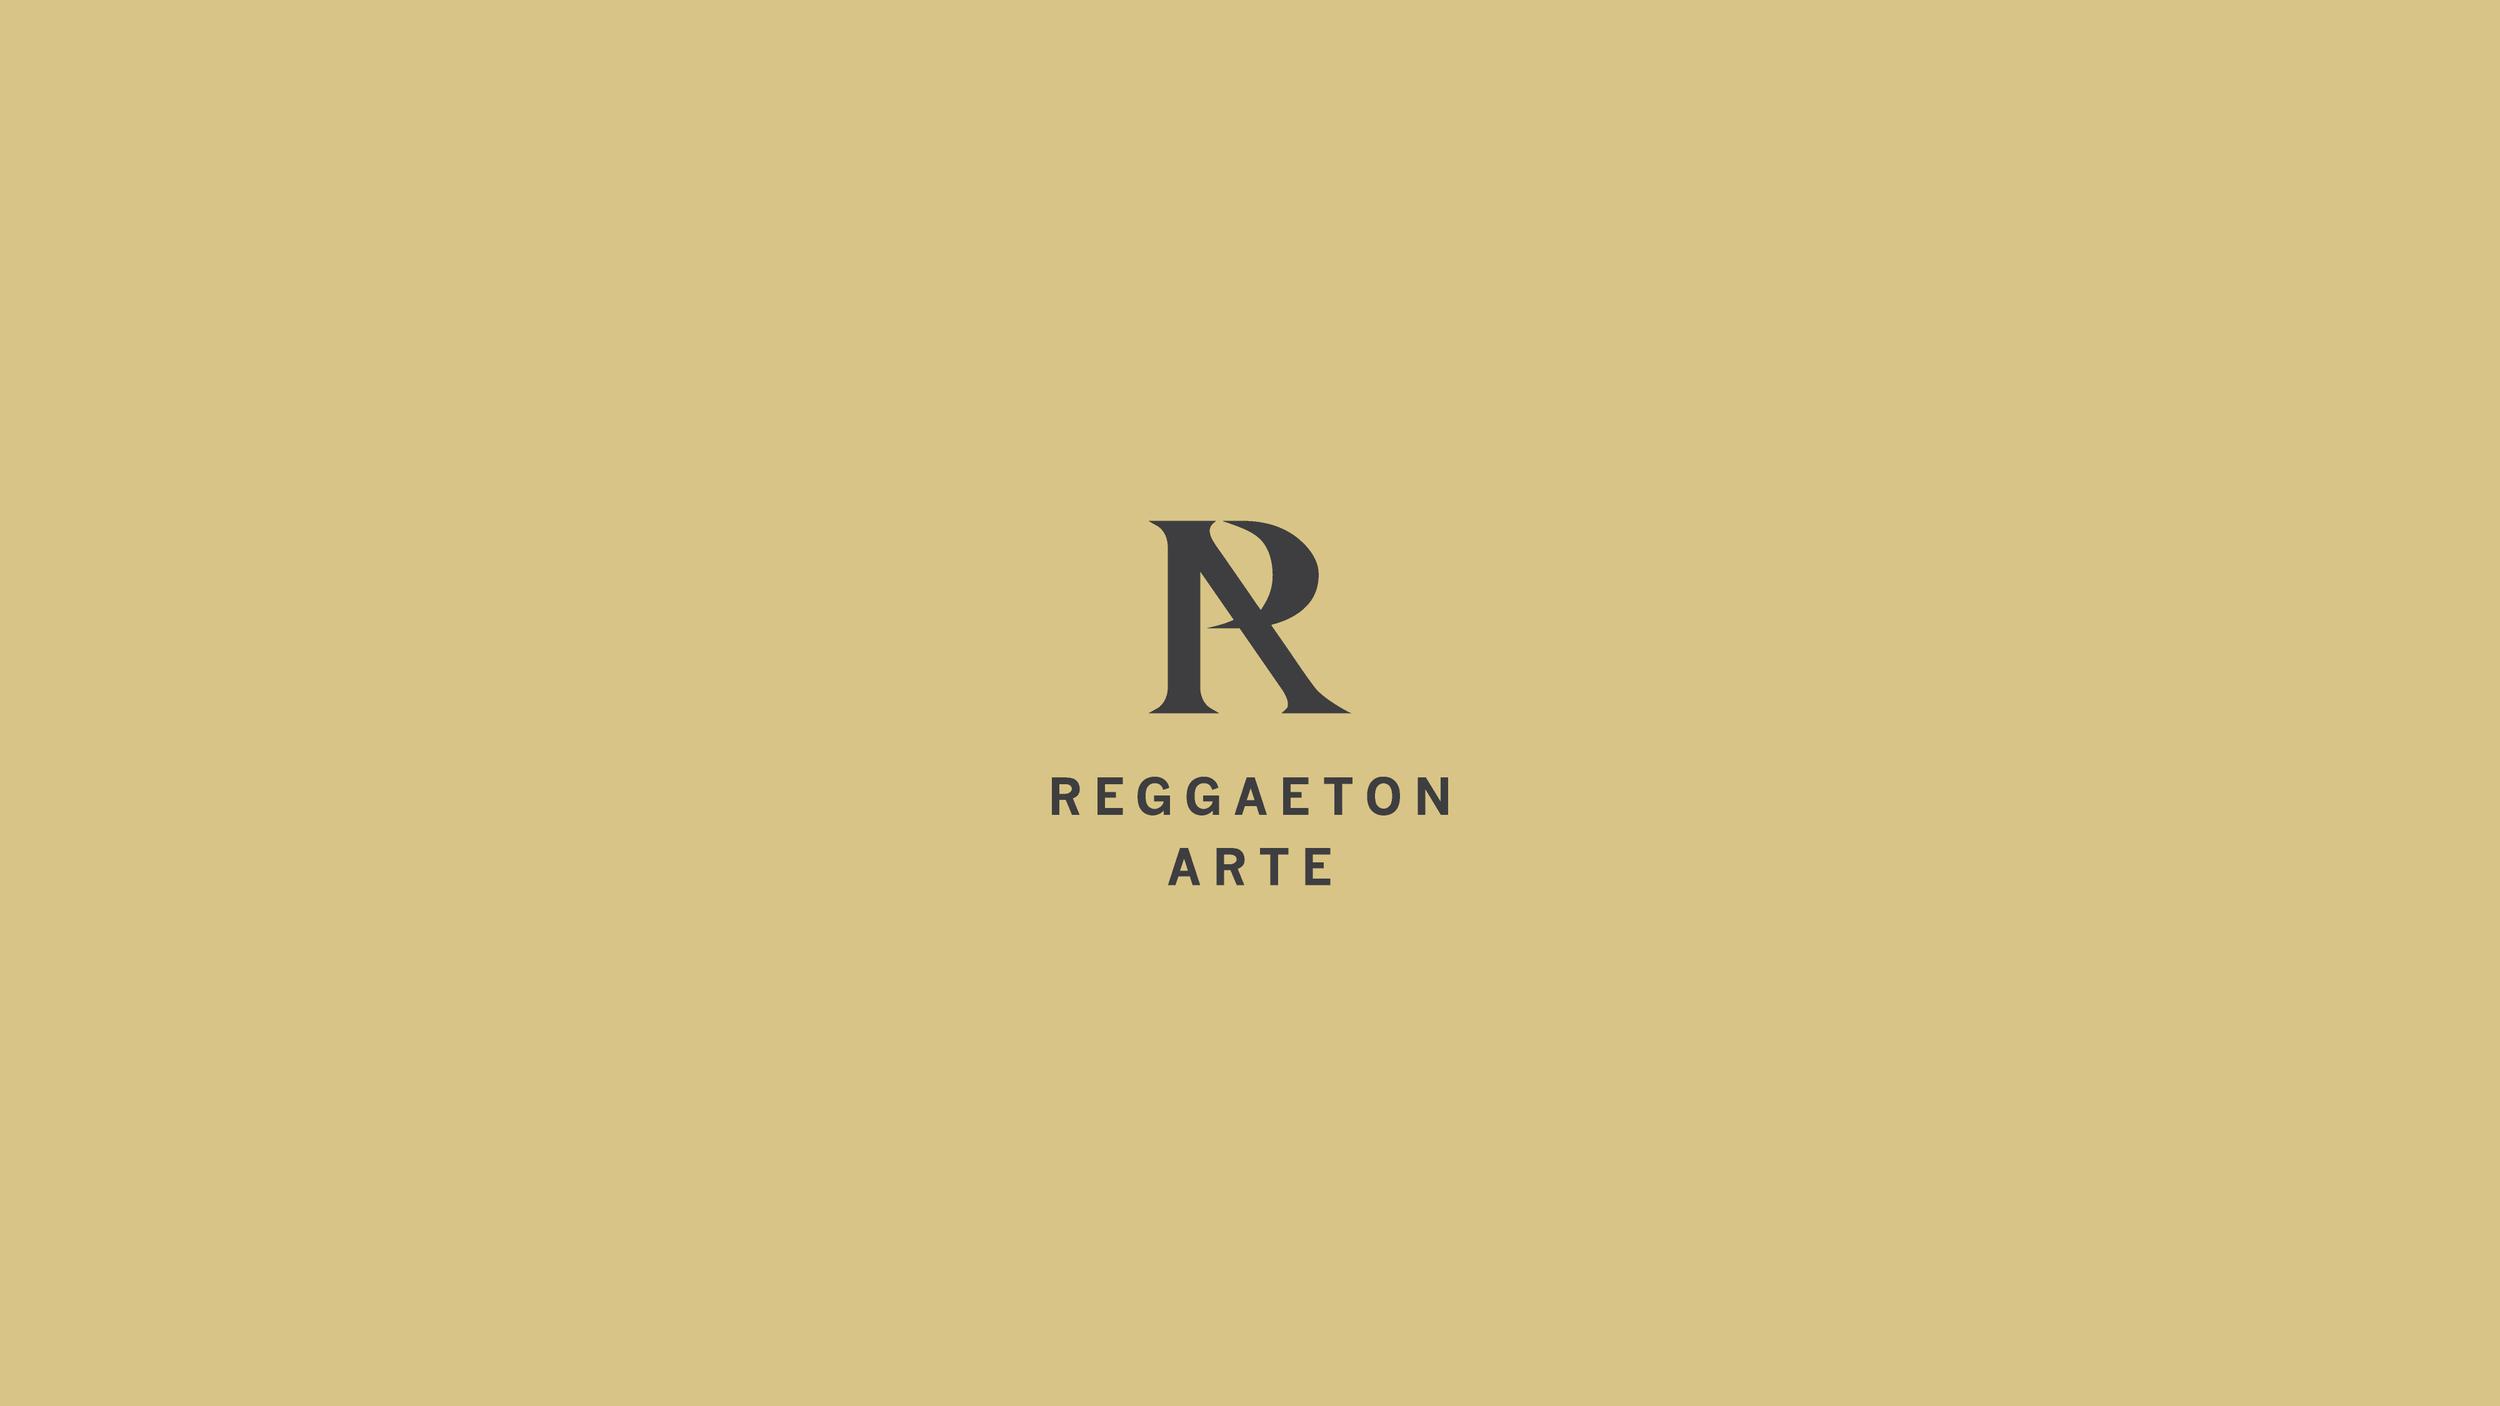 Reggaeton Arte